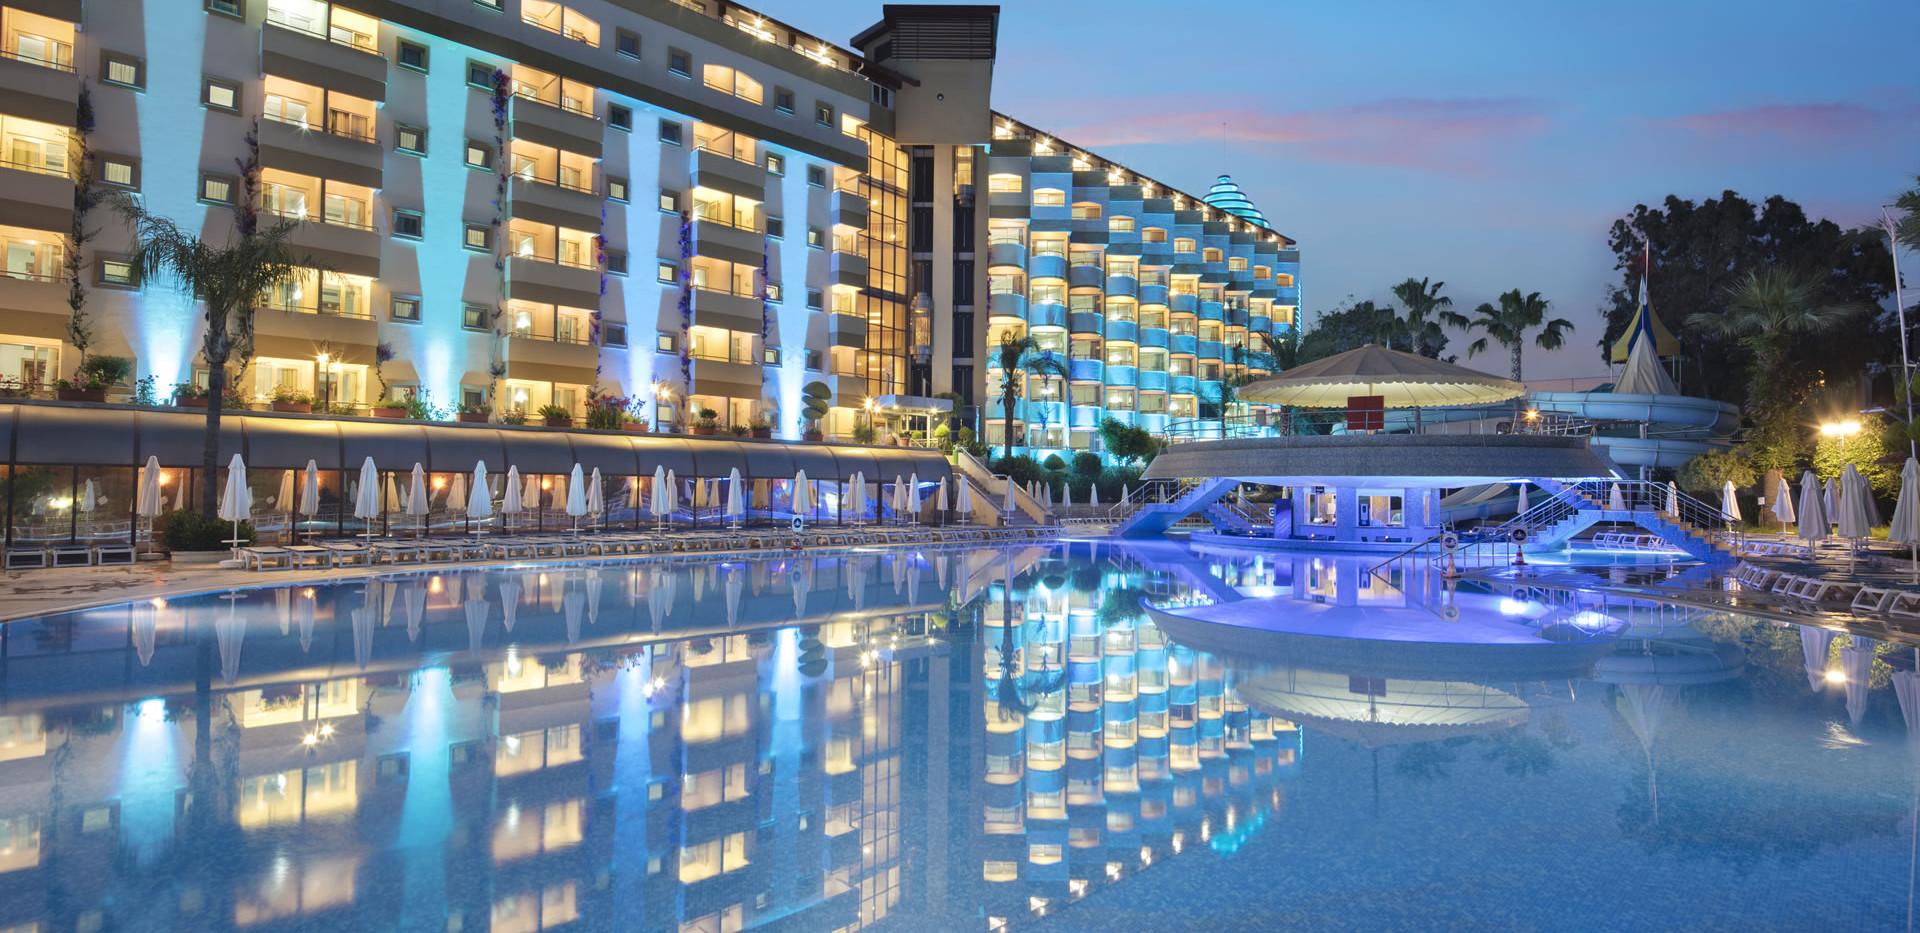 saphir-hotel-villas-otelimiz-278.jpg